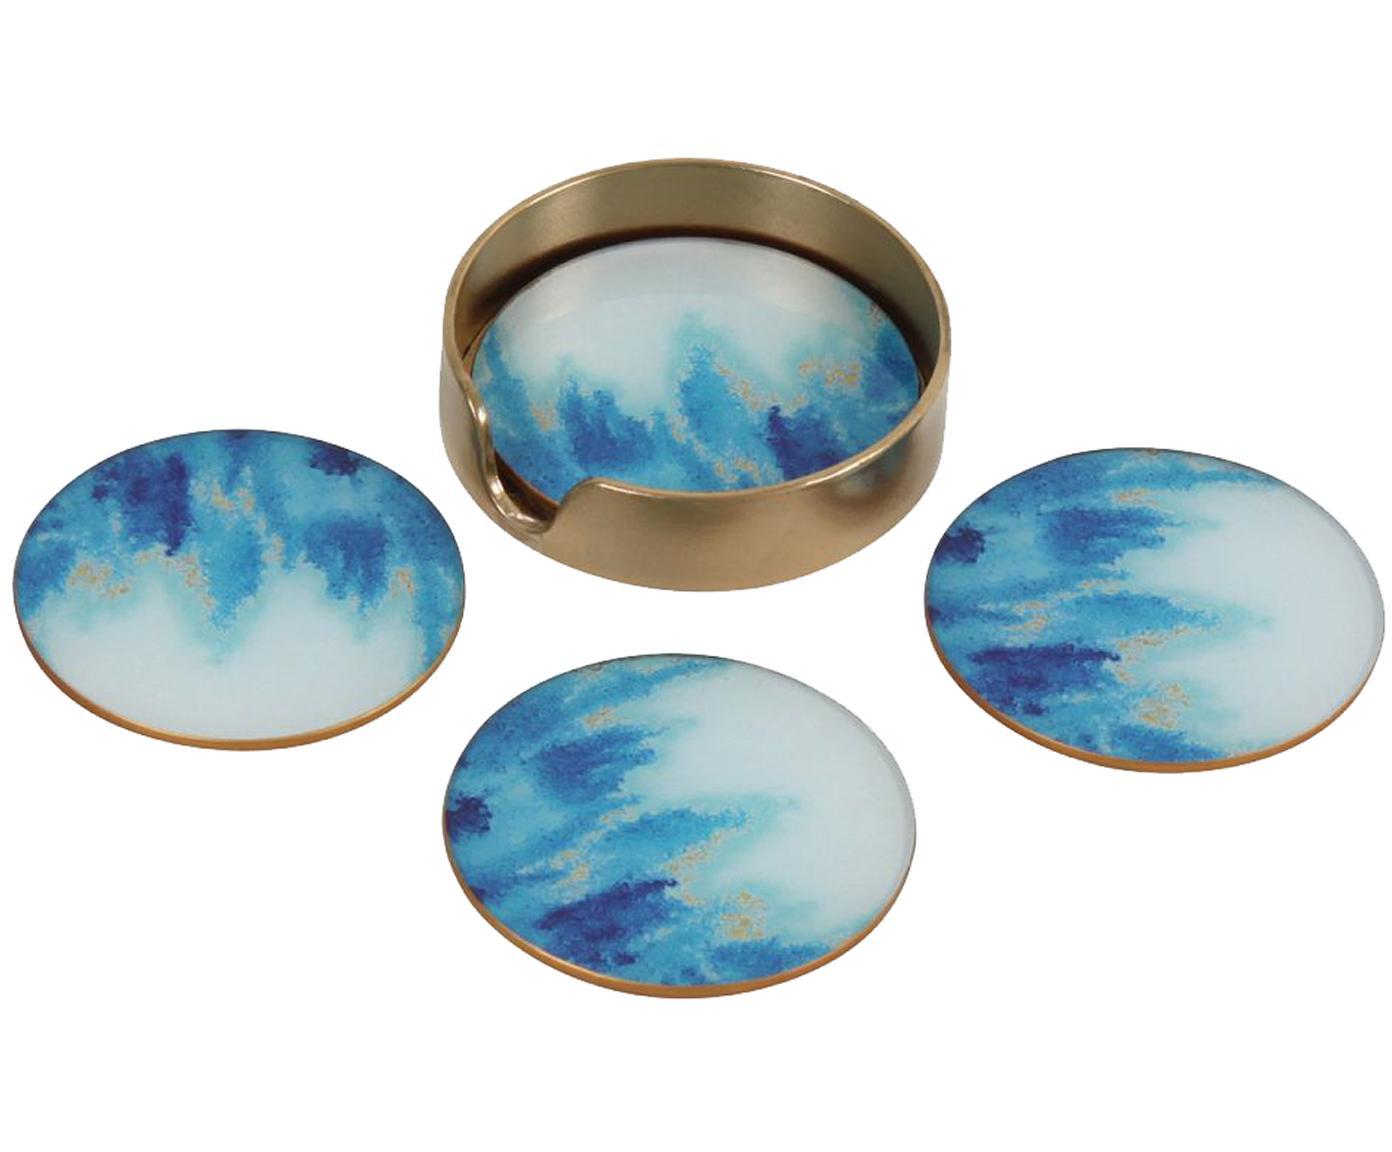 Set de posavasos Stardust, 5pzas., Vidrio, corcho, Azul, blanco, Ø 11 cm